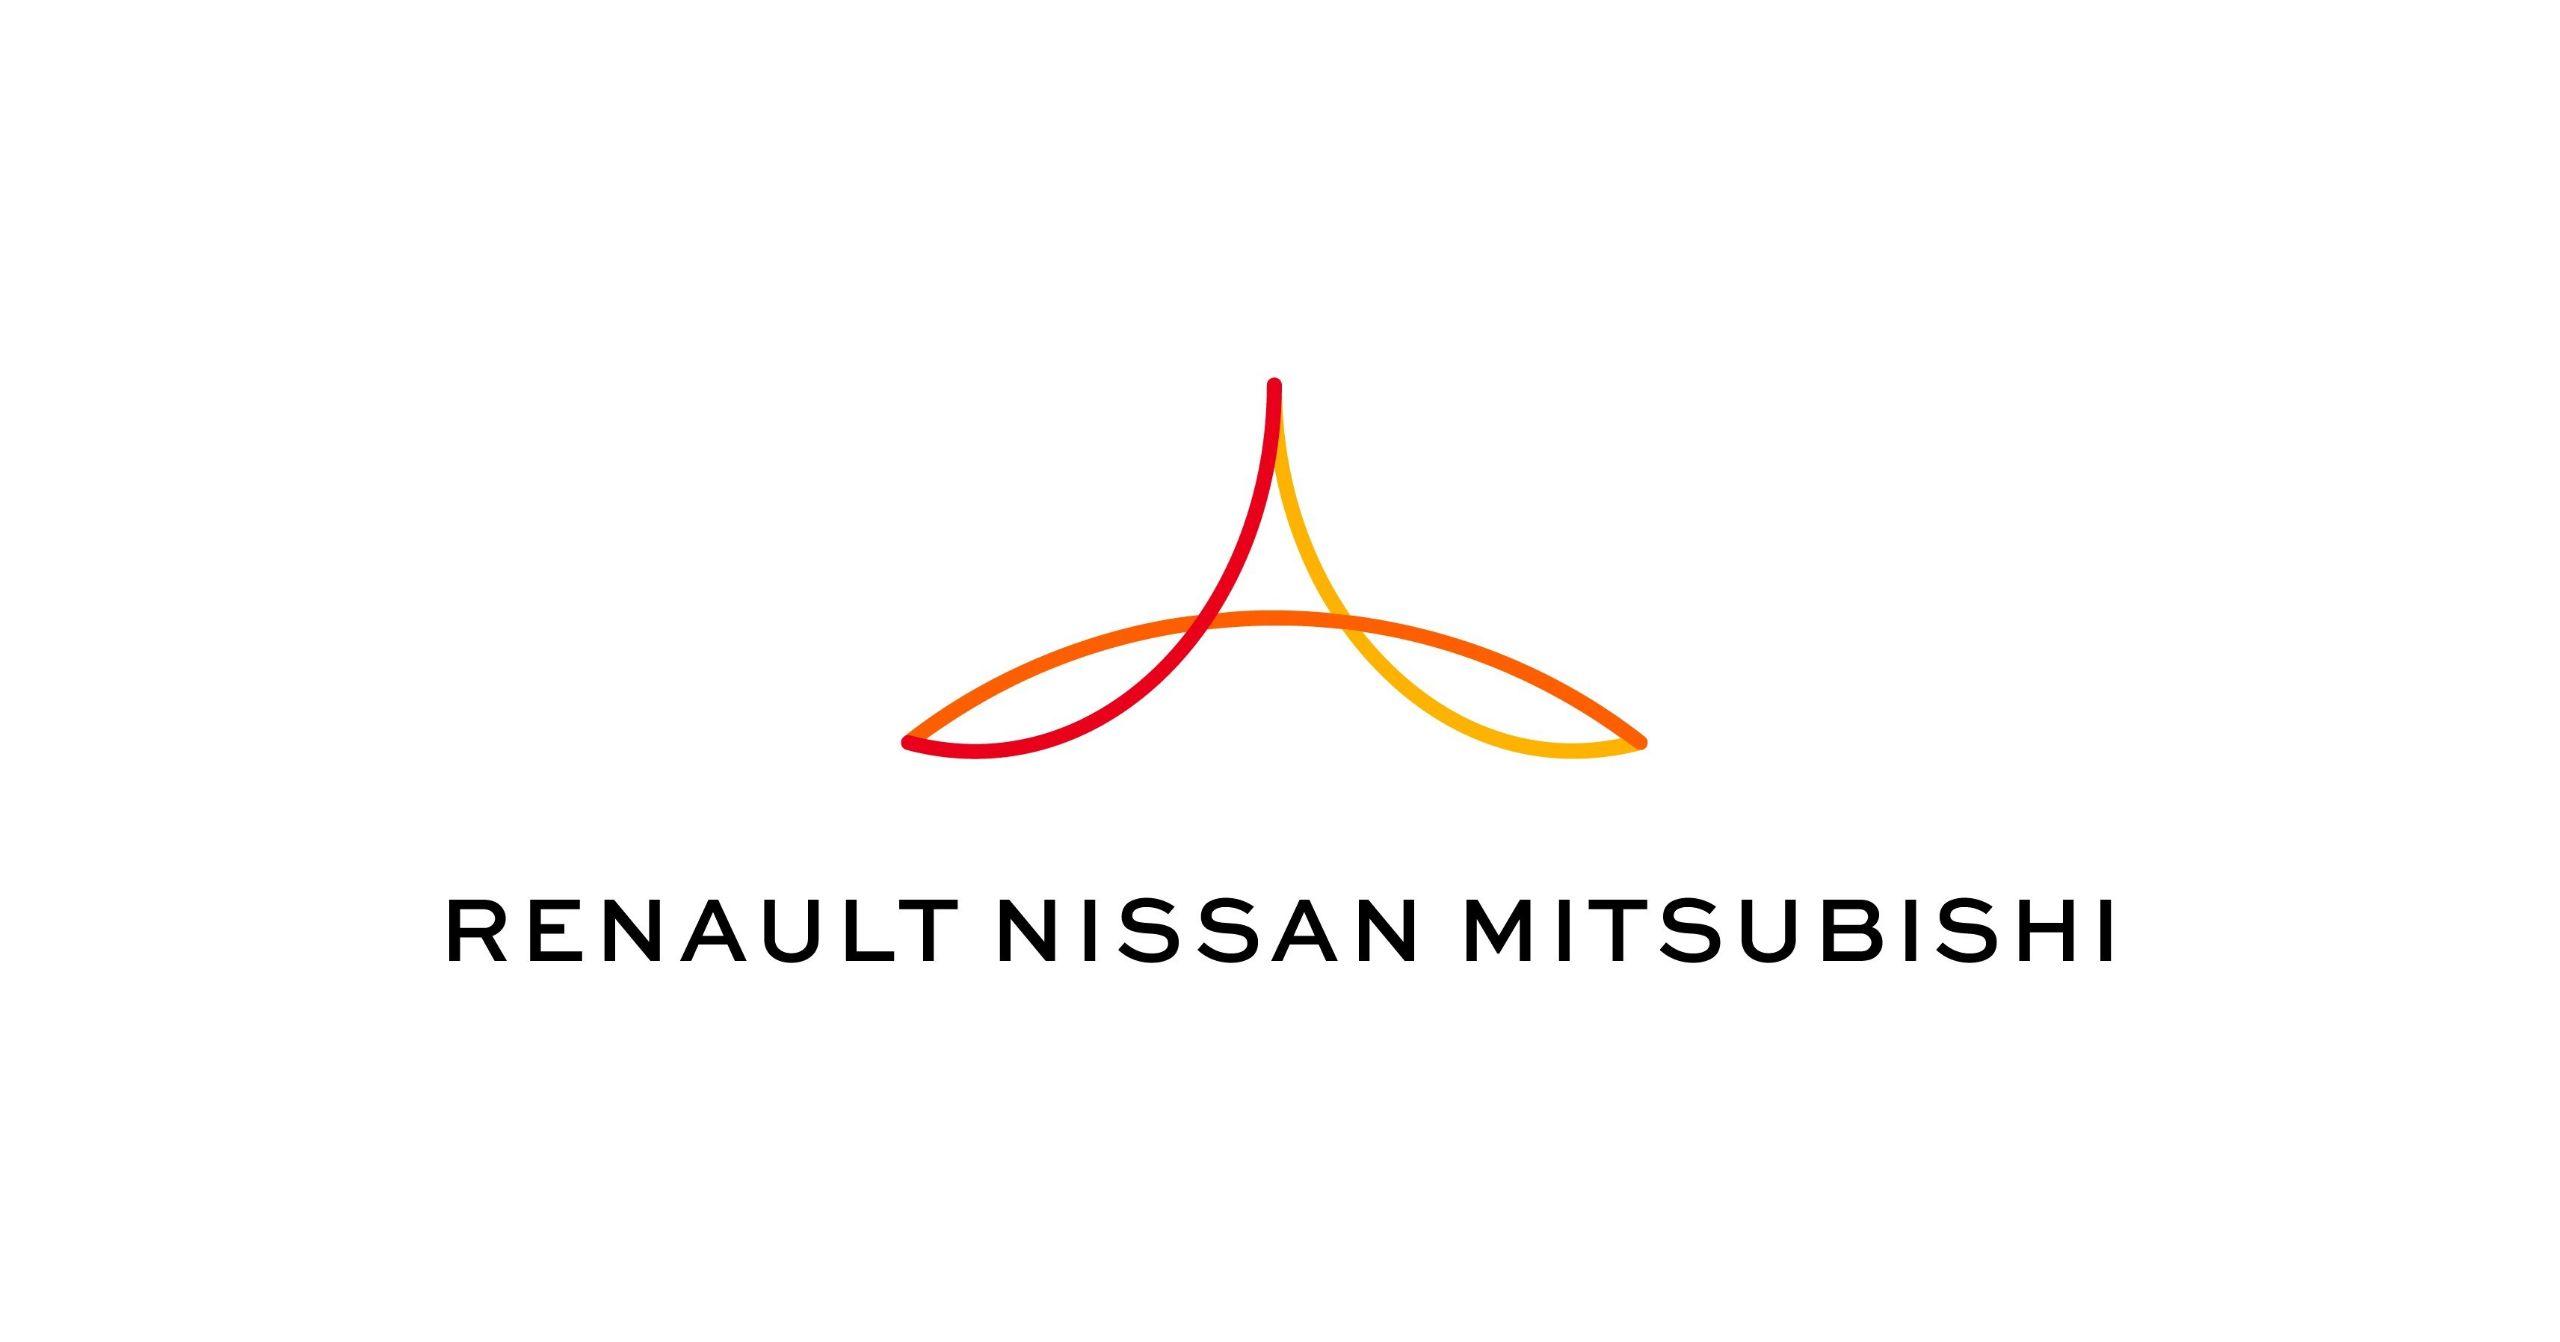 21196918 alliance renault nissan mitsubishi motors logo